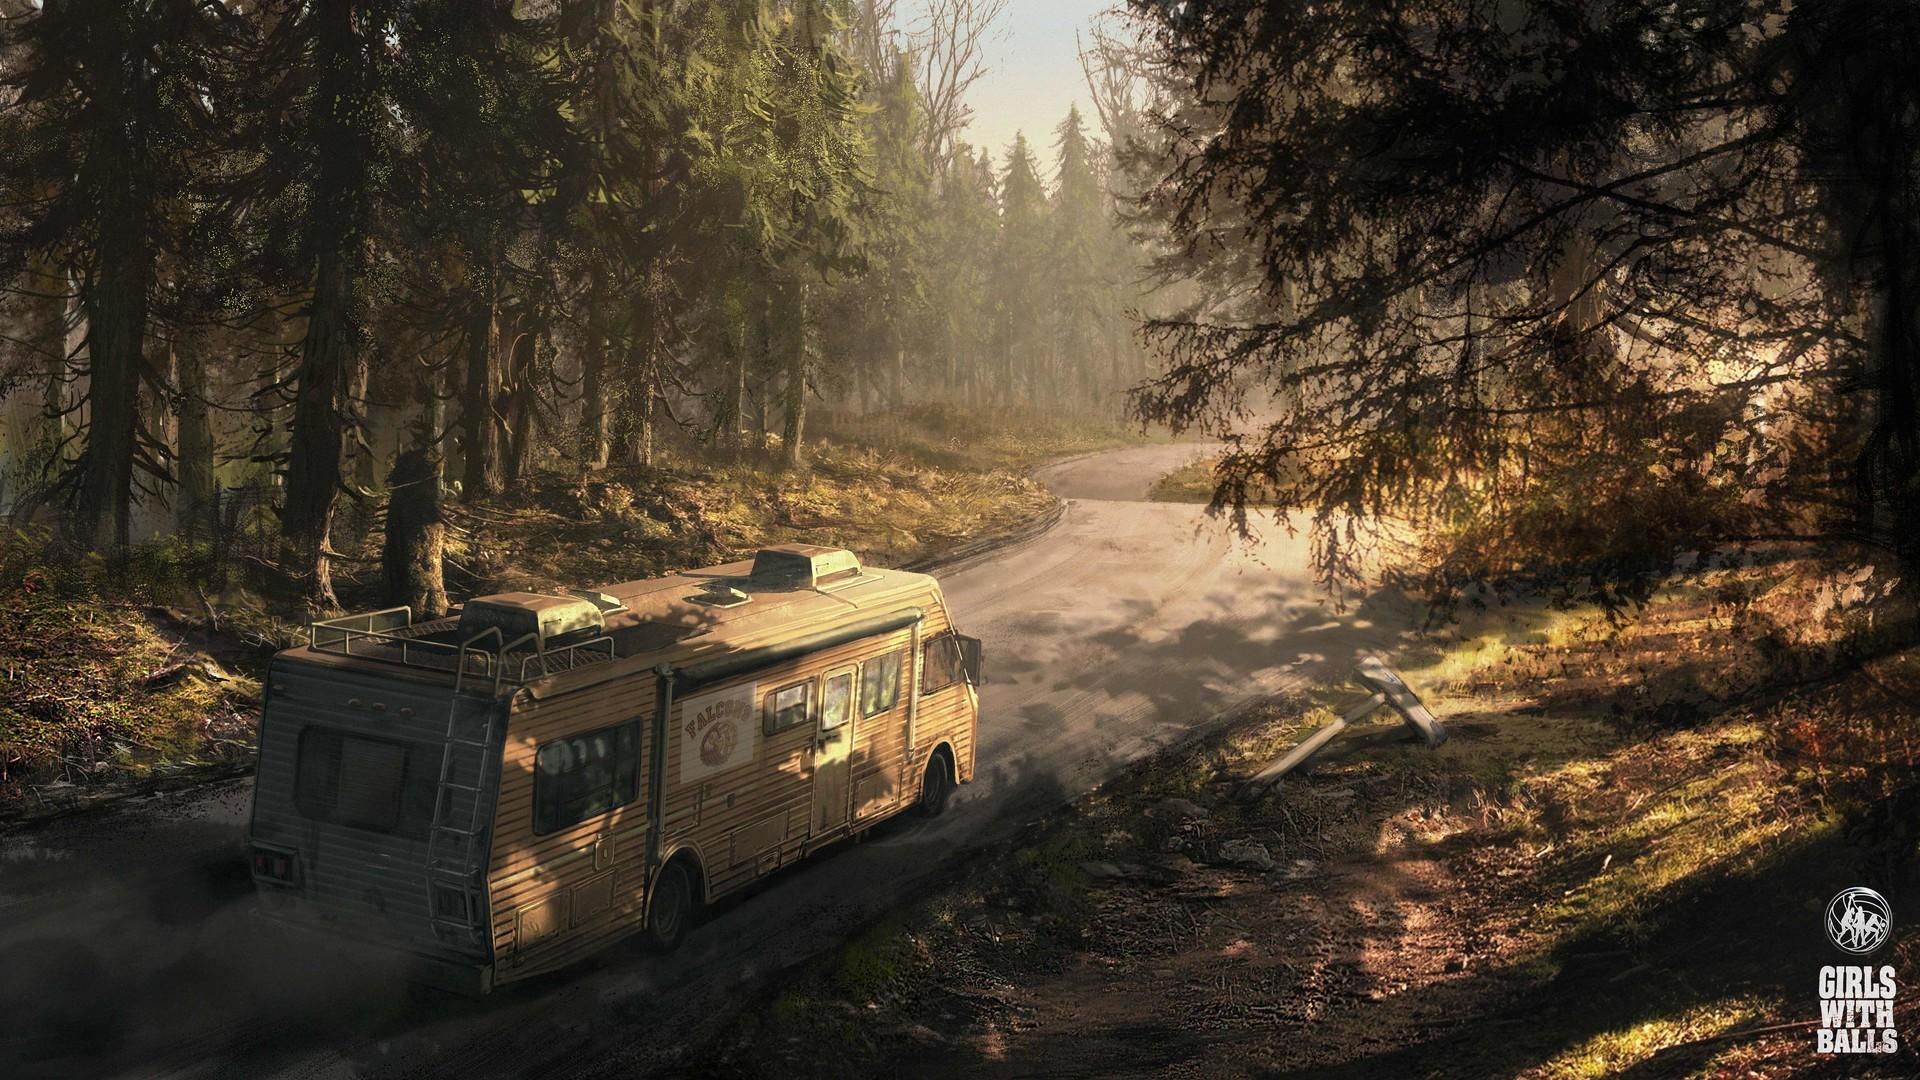 Aleksi briclot gwb aleksi mood 1 forest final small